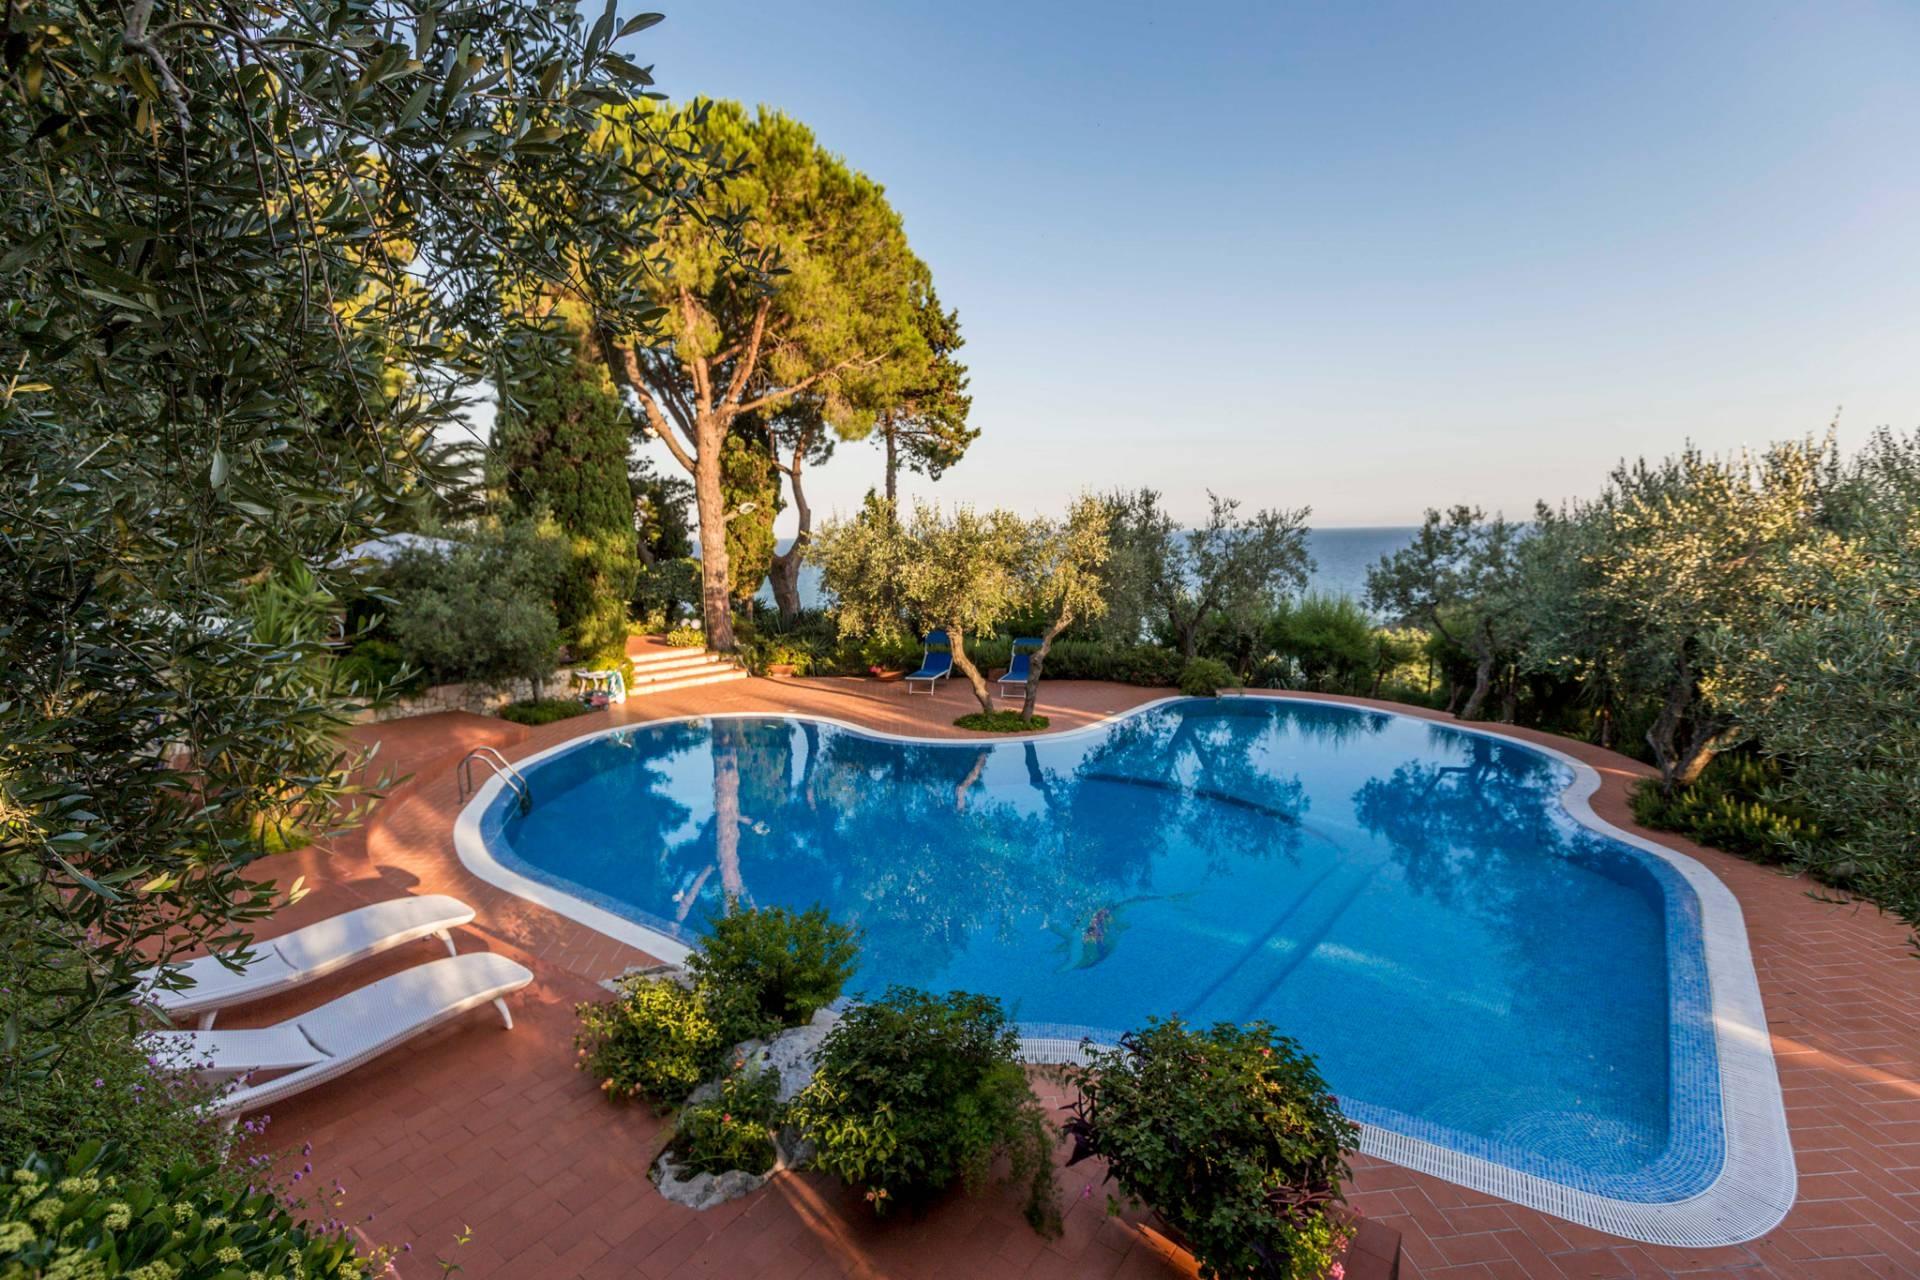 Villa in Vendita a Sperlonga via flacca 12000